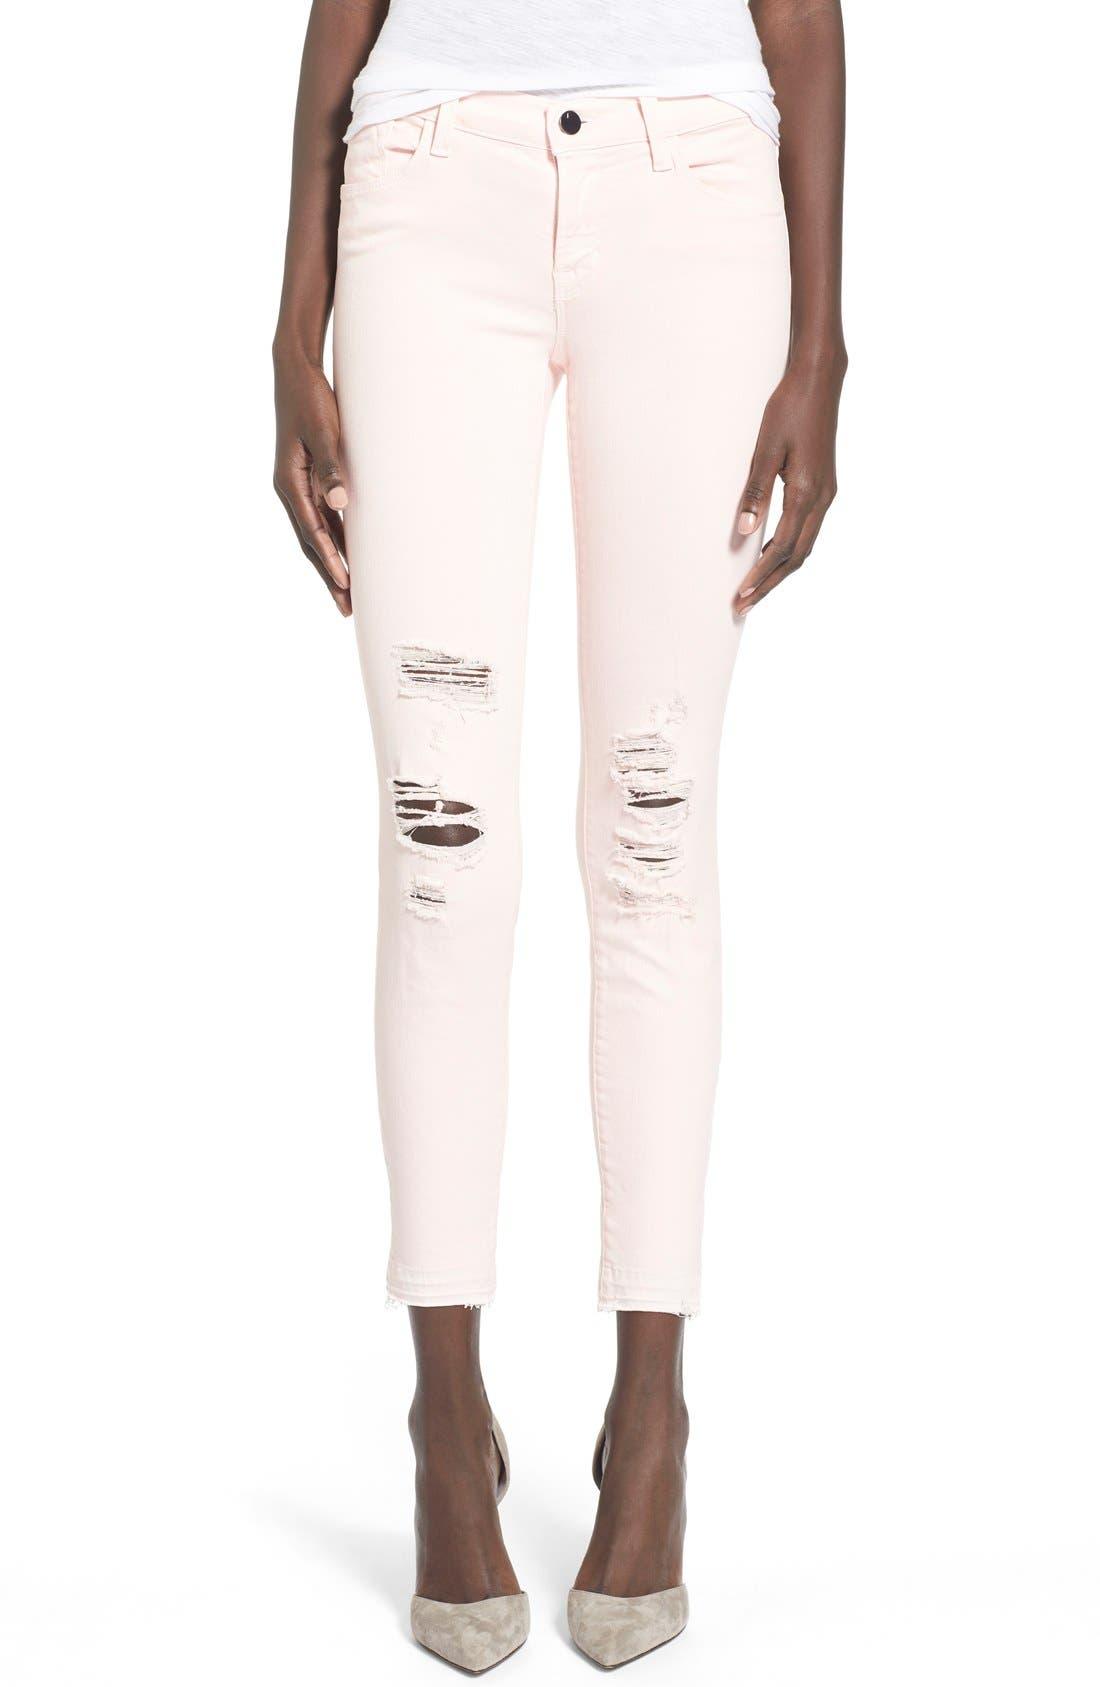 J BRAND 'Little Pink Jean' Low RiseCropSkinny Jeans, Main, color, 650